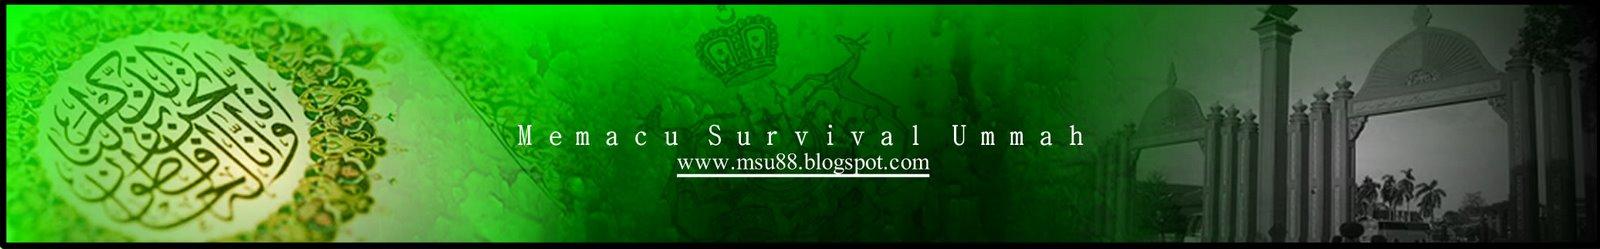 Memacu Survival Ummah